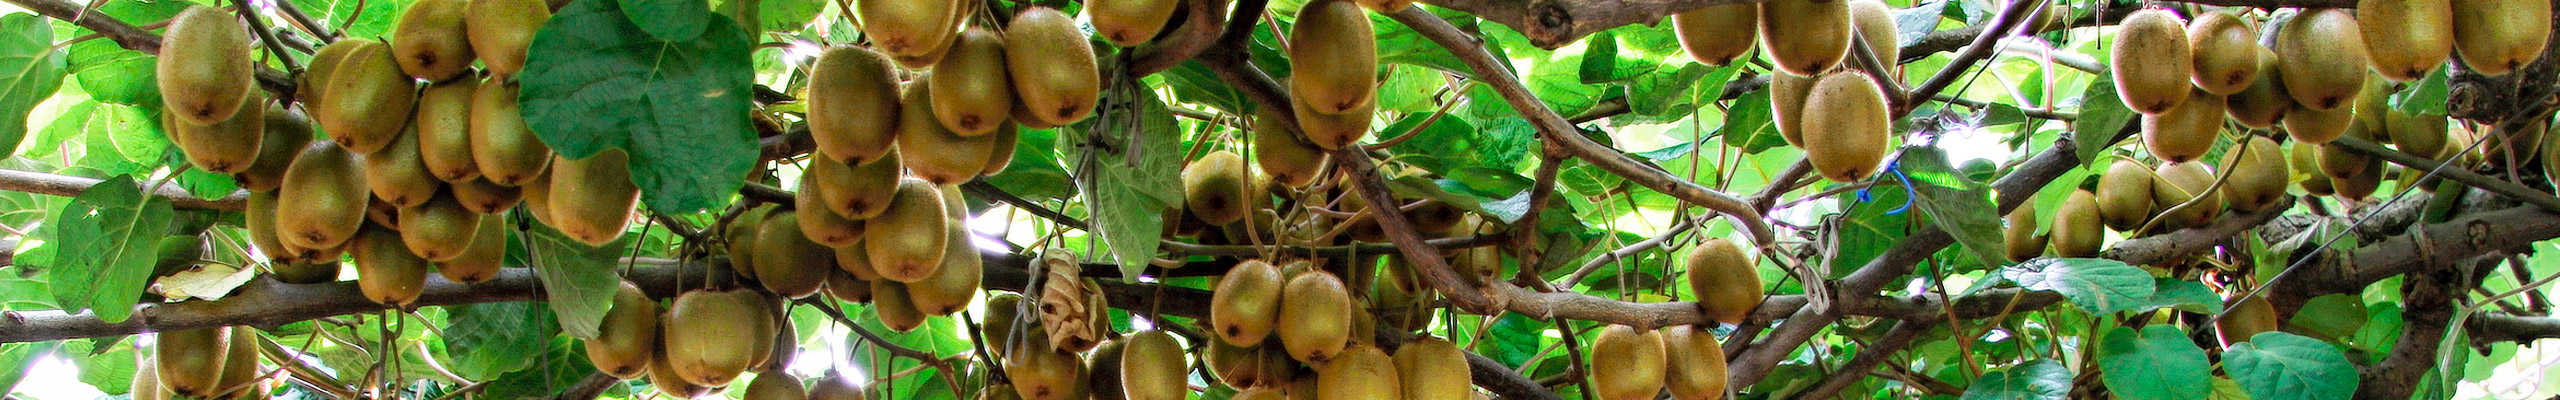 Apoio en projetos: Rede Transfronteiriça de biomassa